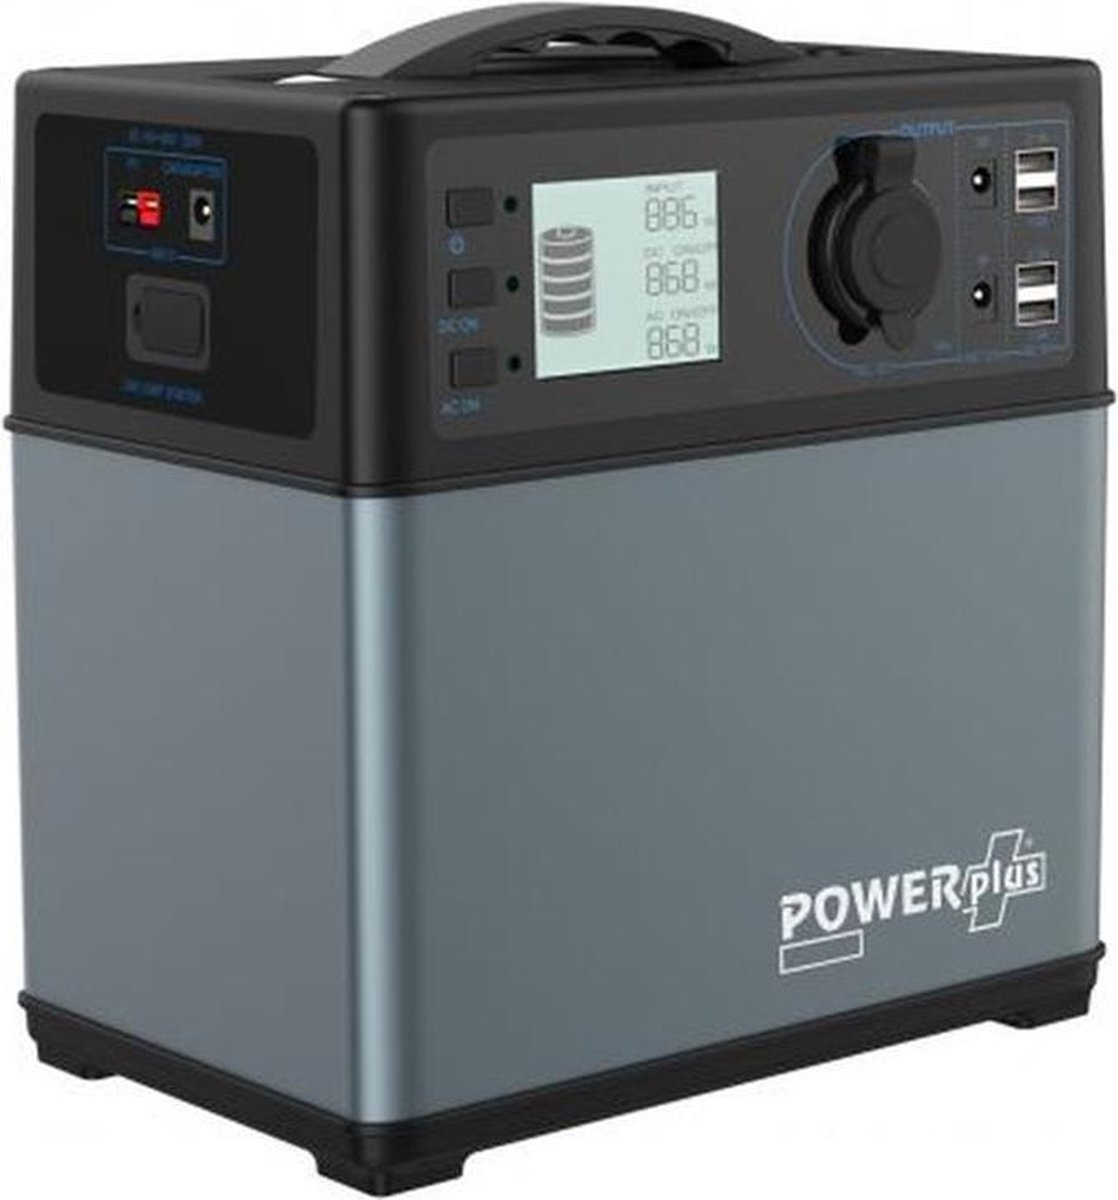 Camping Powerstation Wallaby - zonne-energie - zonnecel - laadregelaar -  powerplus - oplader - 220v